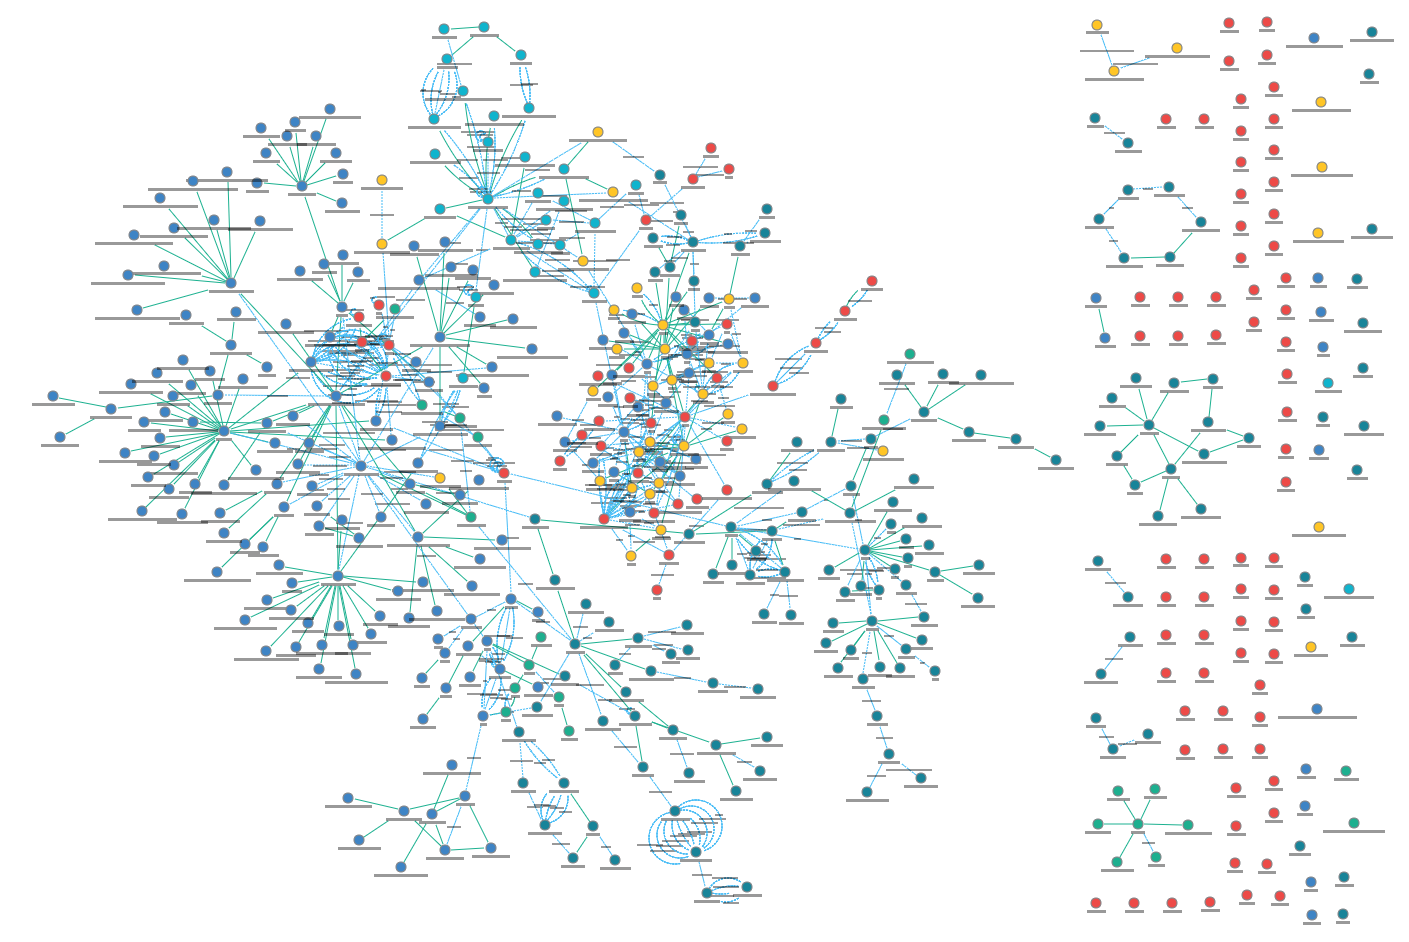 4.0 graph network